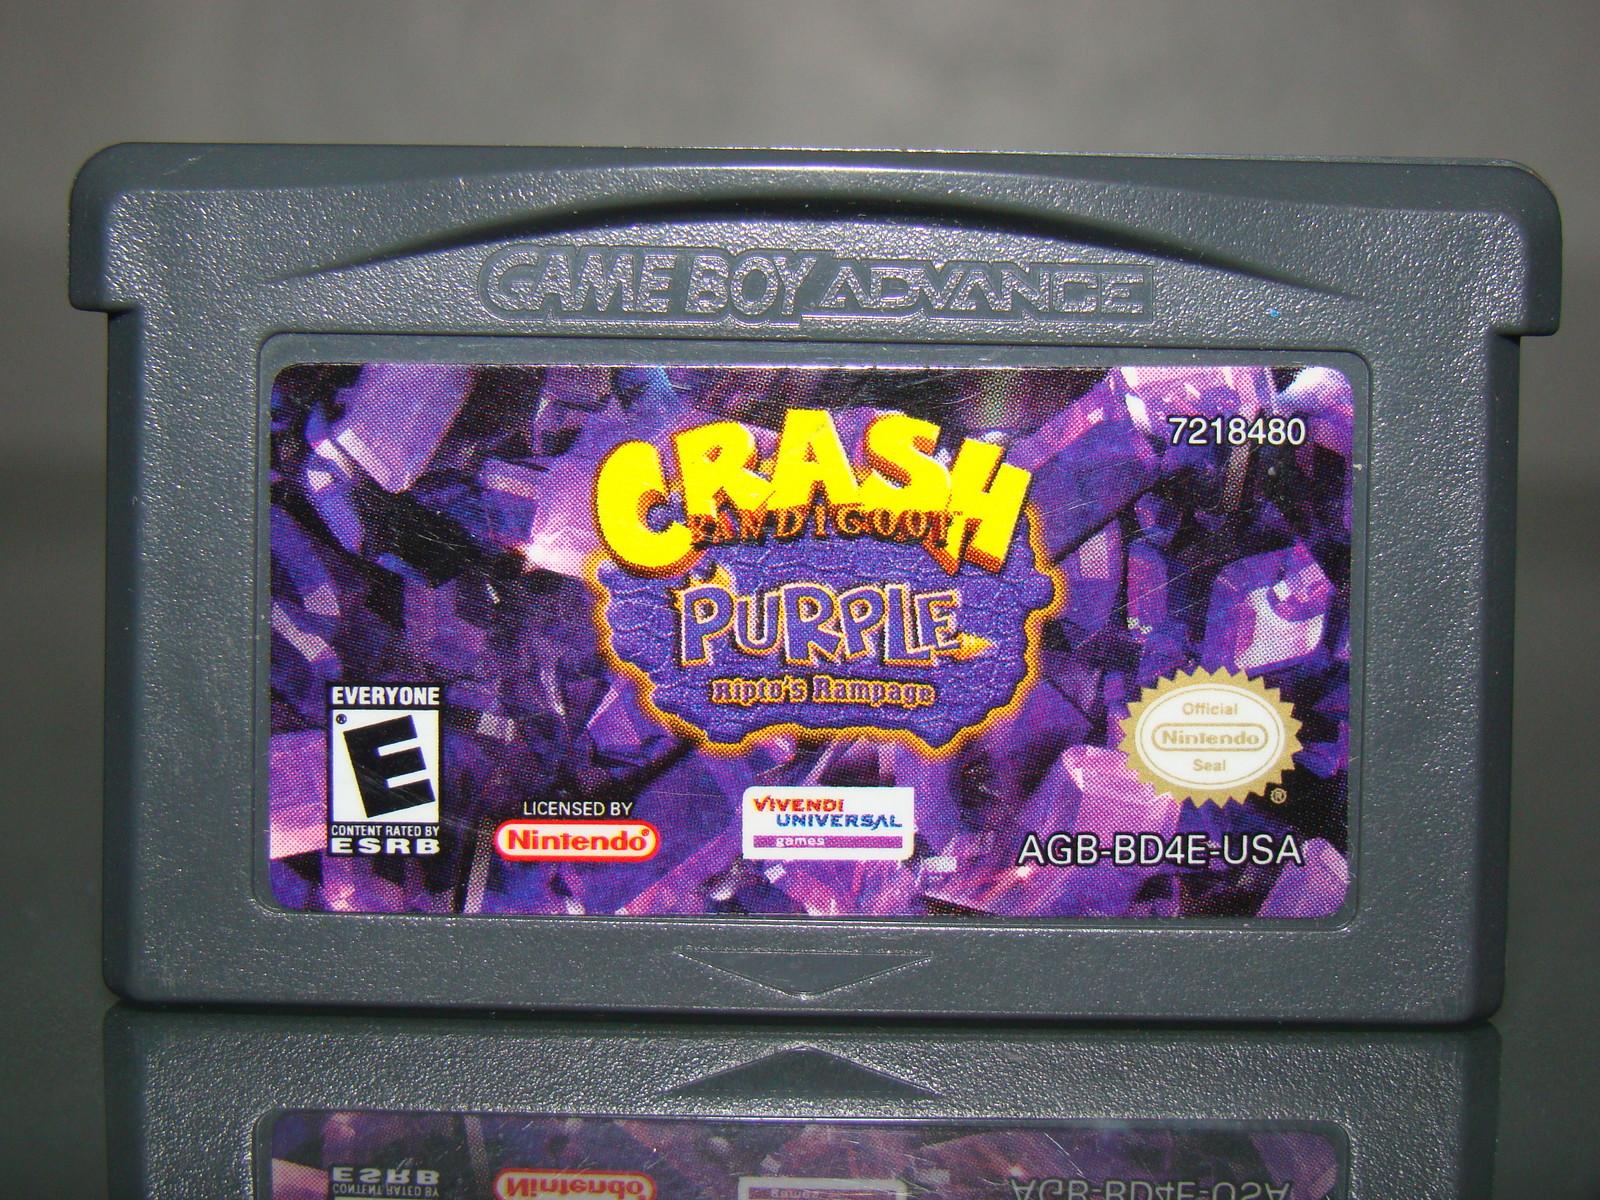 Nintendo GAMEBOY ADVANCE - CRASH BANDICOOT - PURPLE Ripto's Rampage